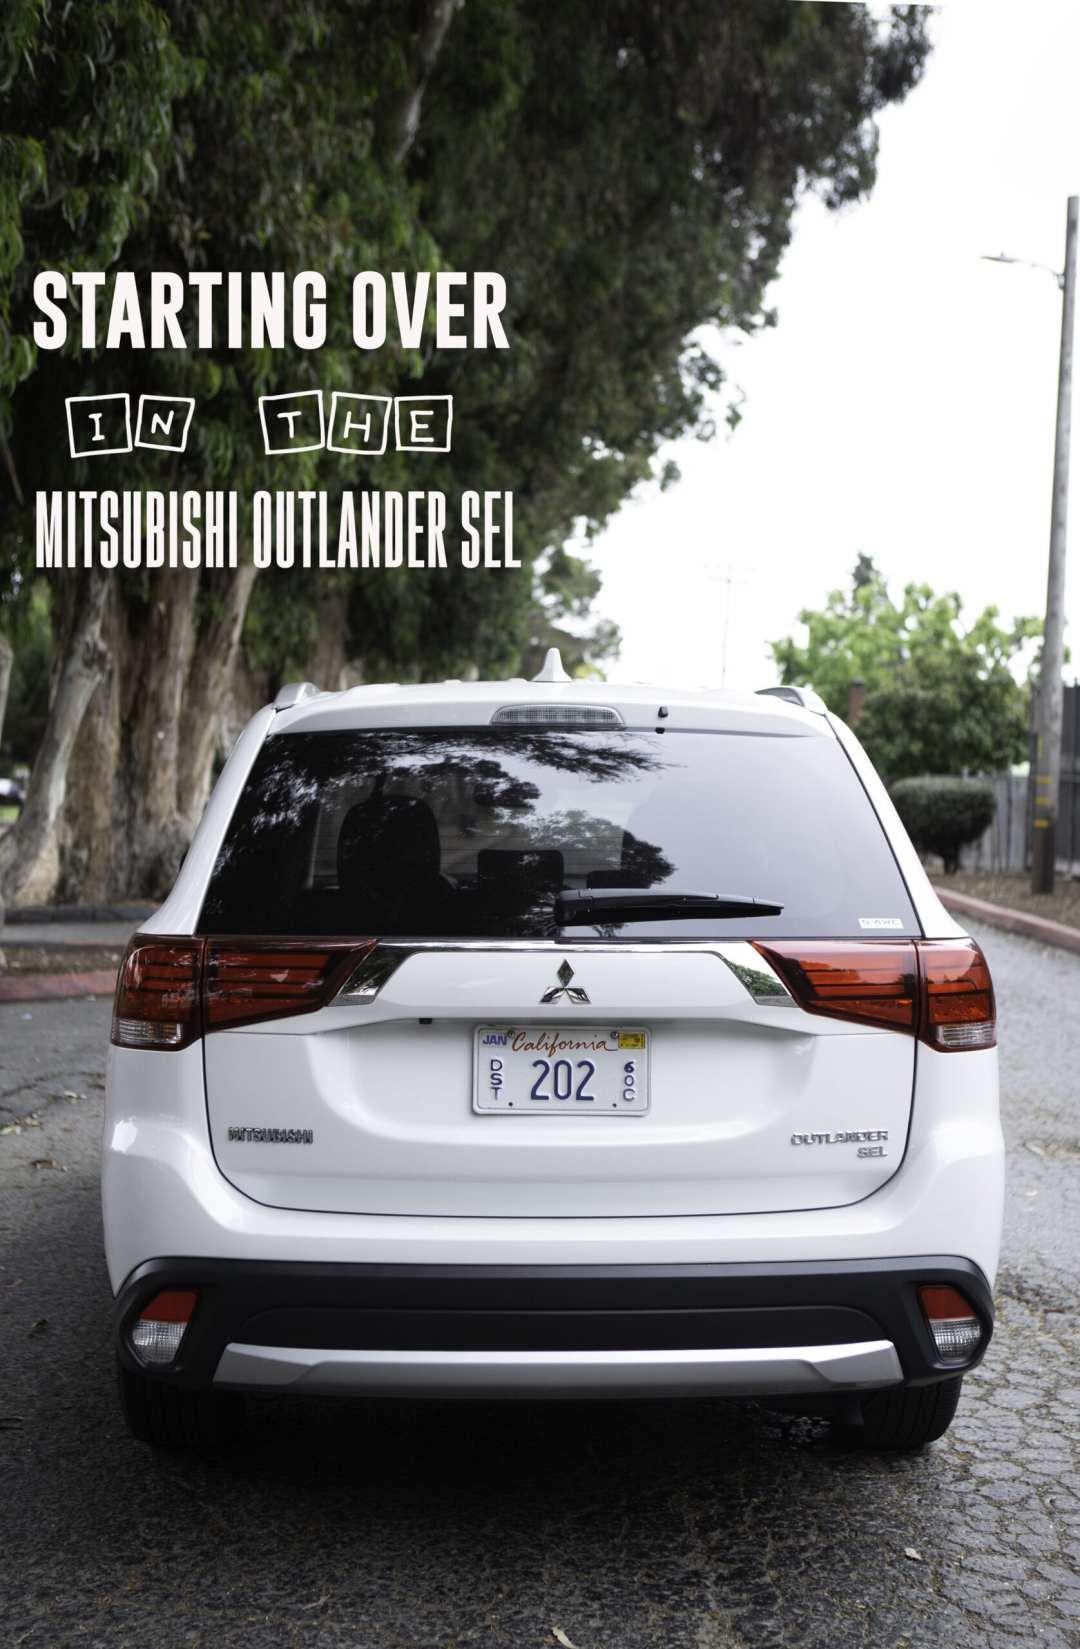 Mitsubishi Outlander SEL Road Test